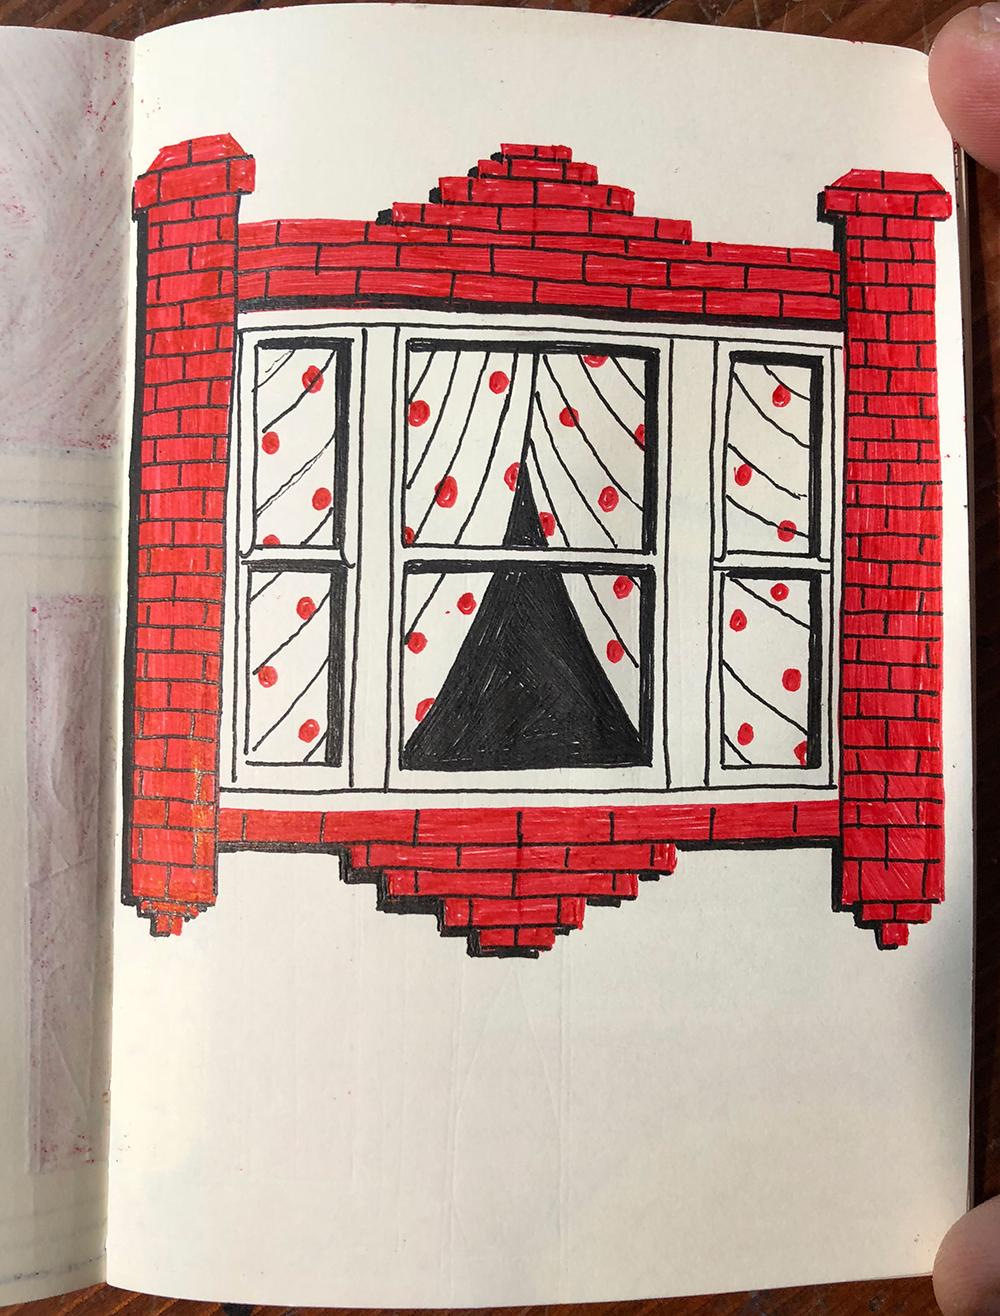 tom-gerrard-bench-talk-daily drawing-3.jpg